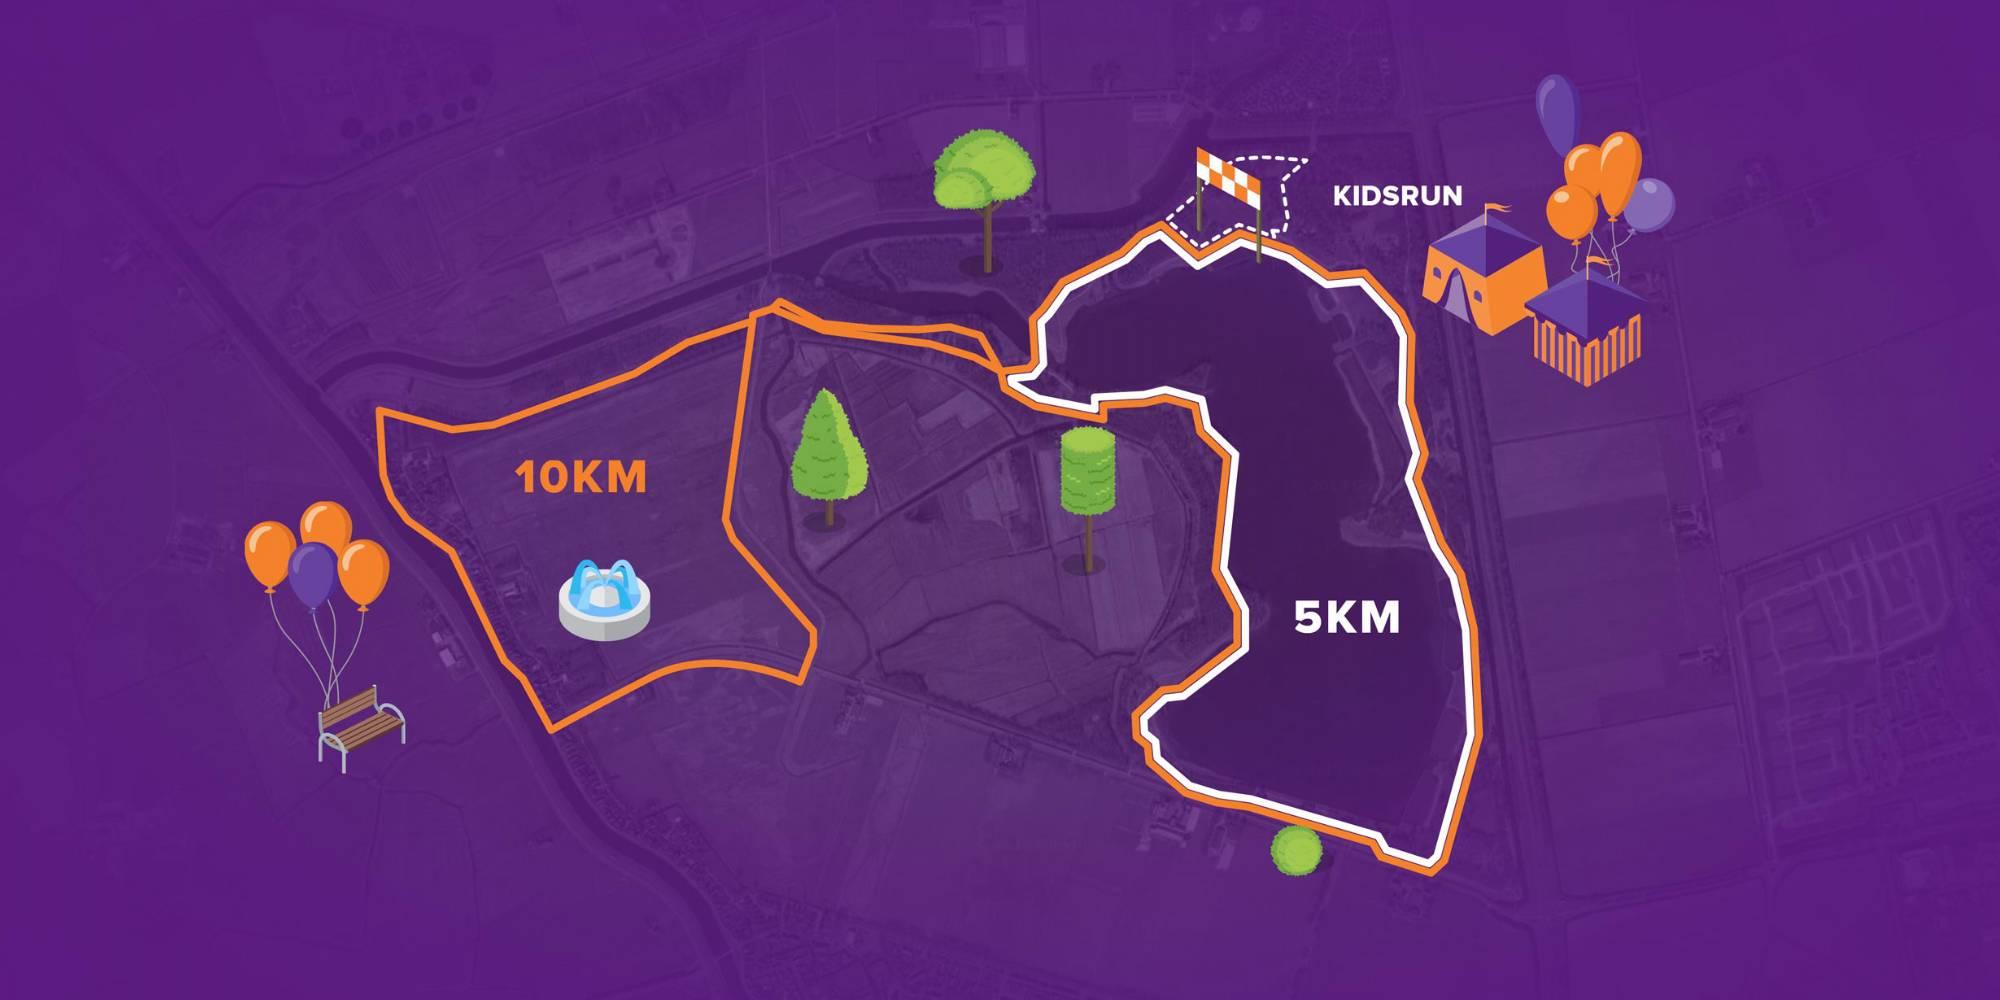 Afbeelding van de 10 kilometer, 5 kilometer en 1 kilometer KidsRun route van Run for KiKa Alkmaar op 7 juni 2020  op Geestmerambacht Alkmaar